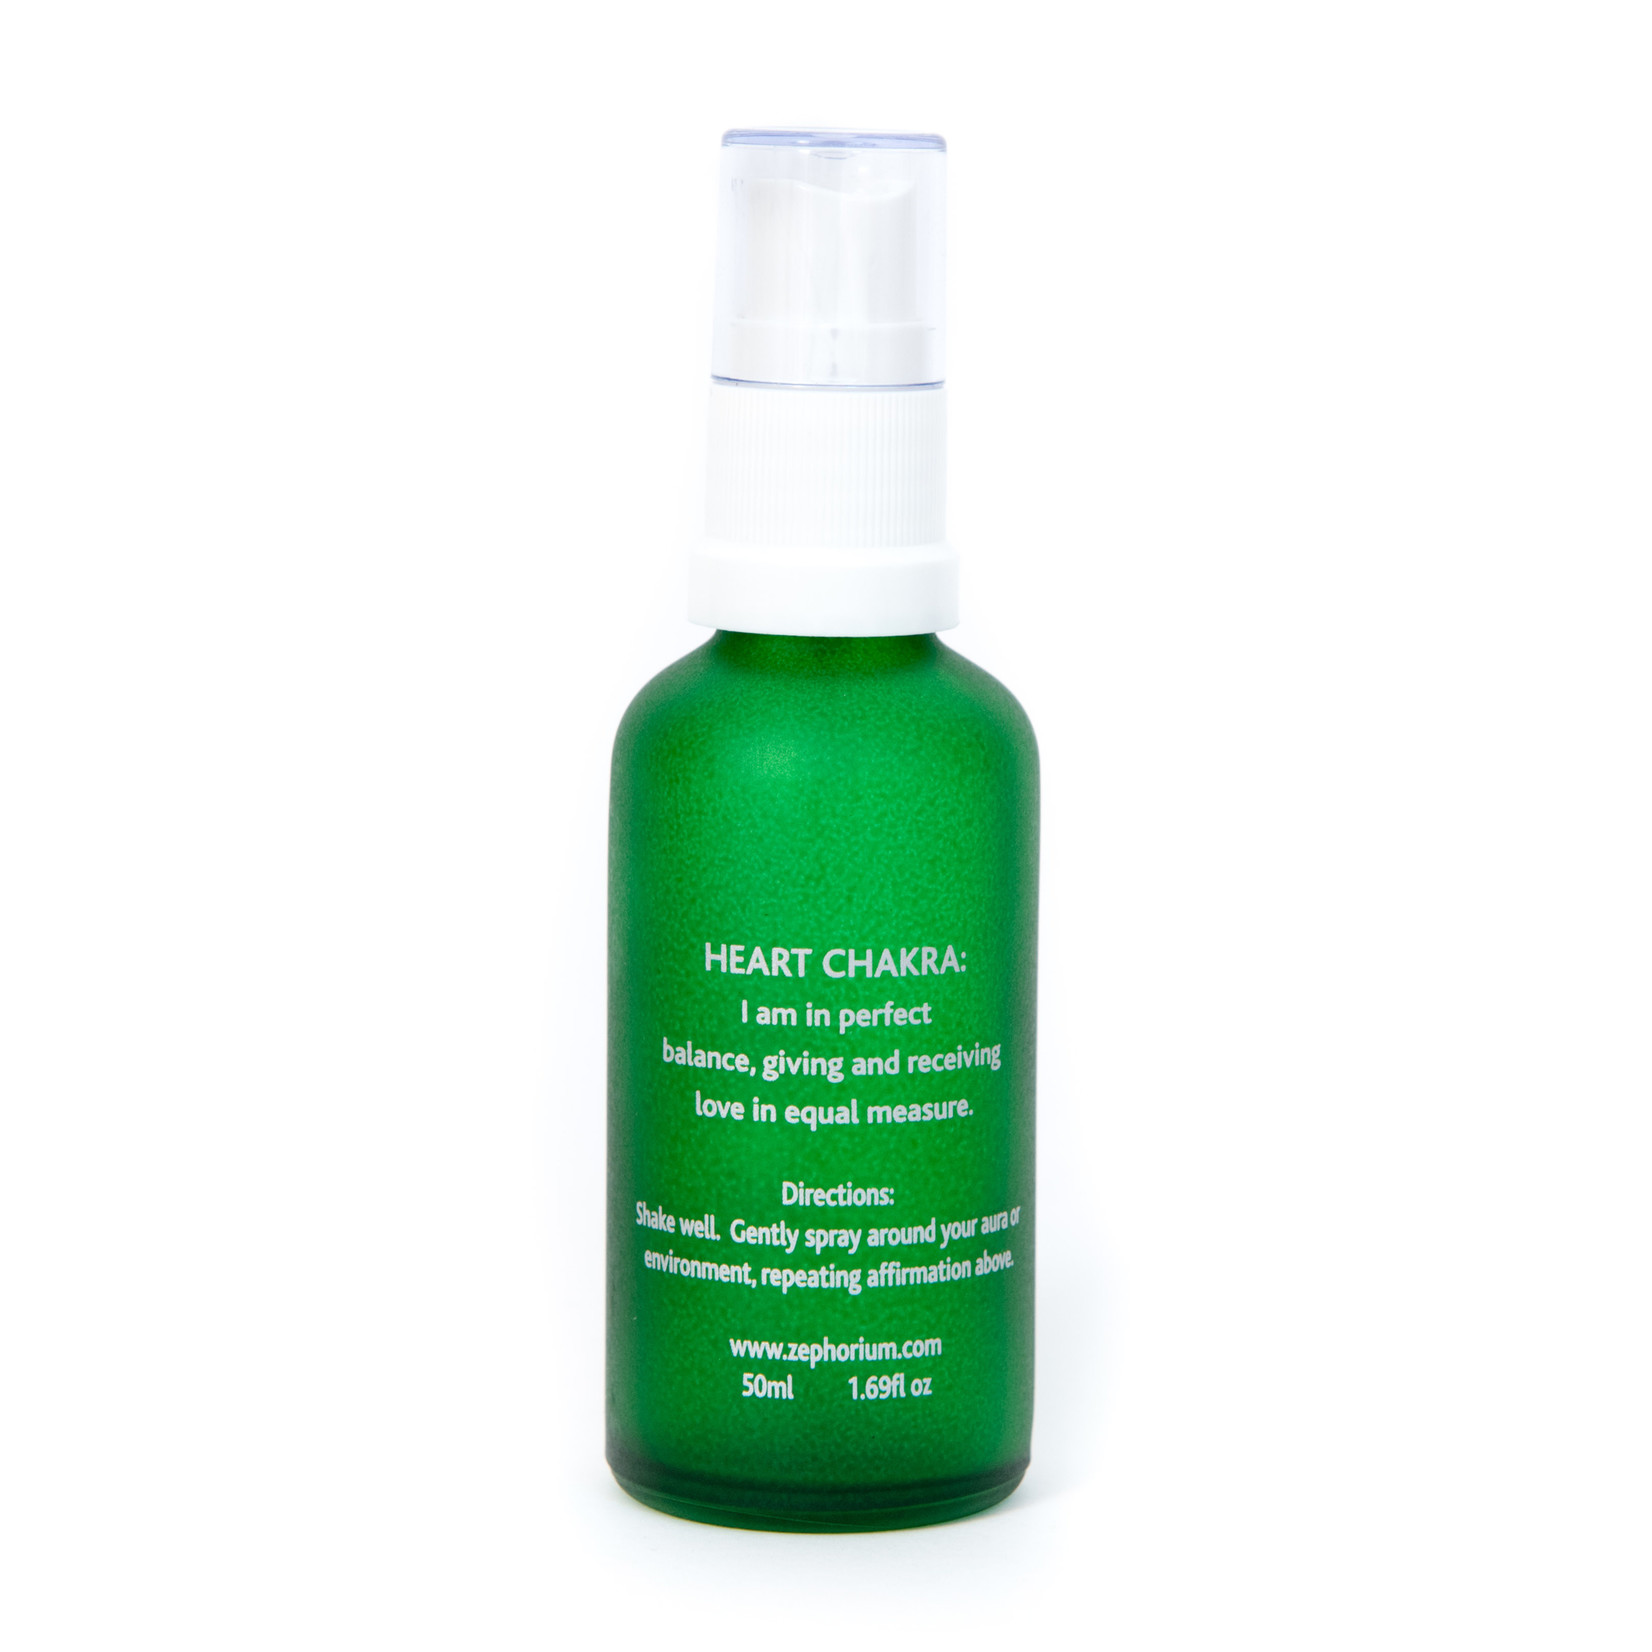 Zephorium Emerald auraspray Zephorium - bescherm je hartchakra